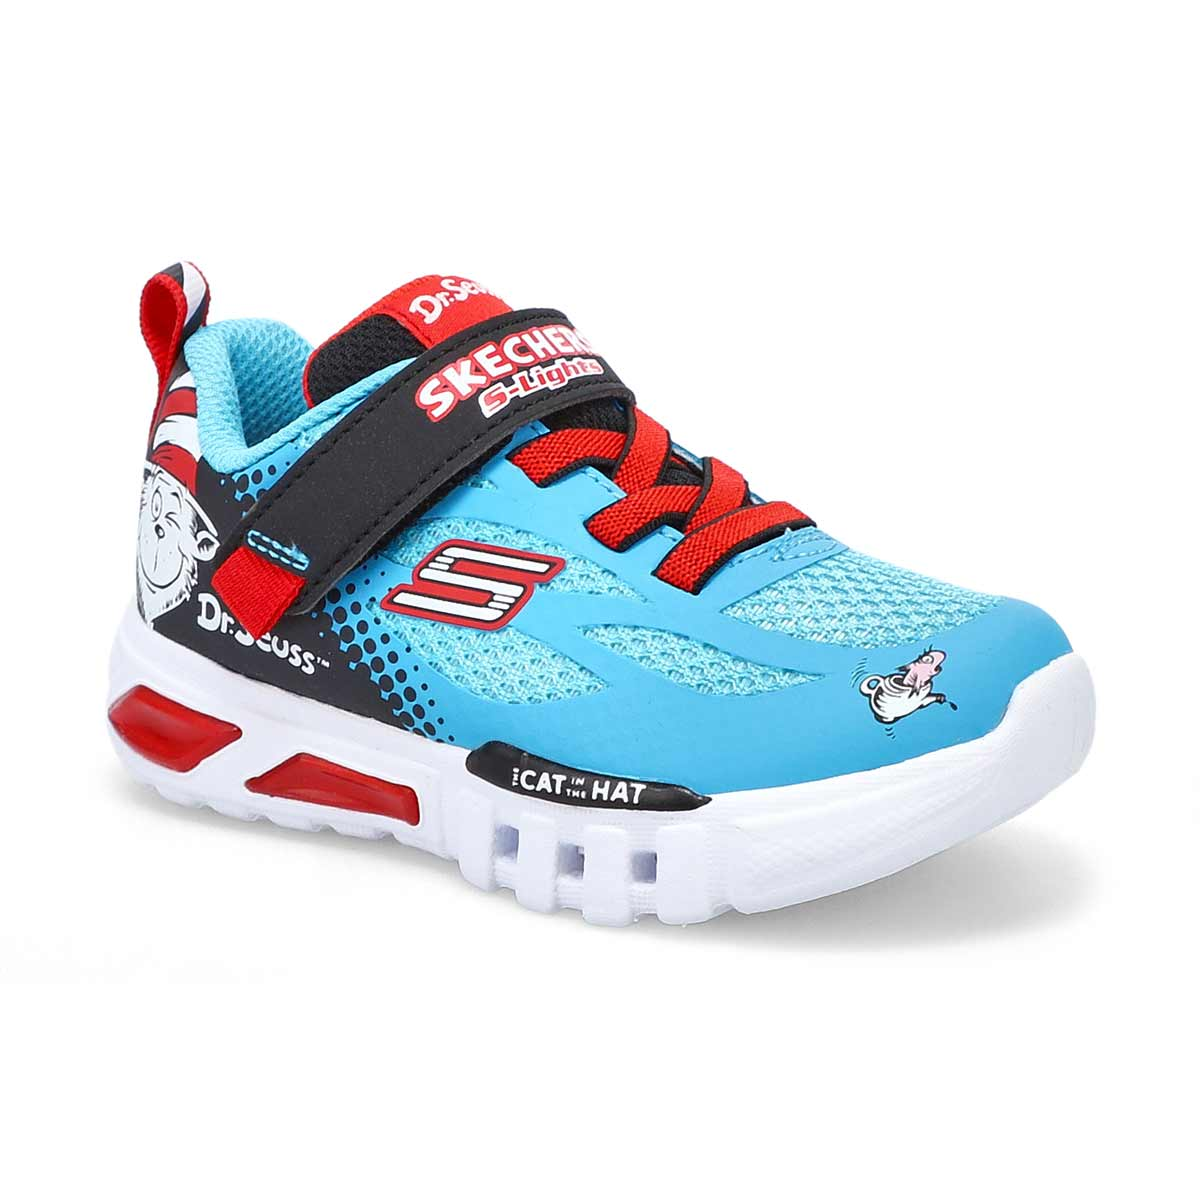 Boys' Flex Glow Dr. Seuss Sneakers - Blue/Black